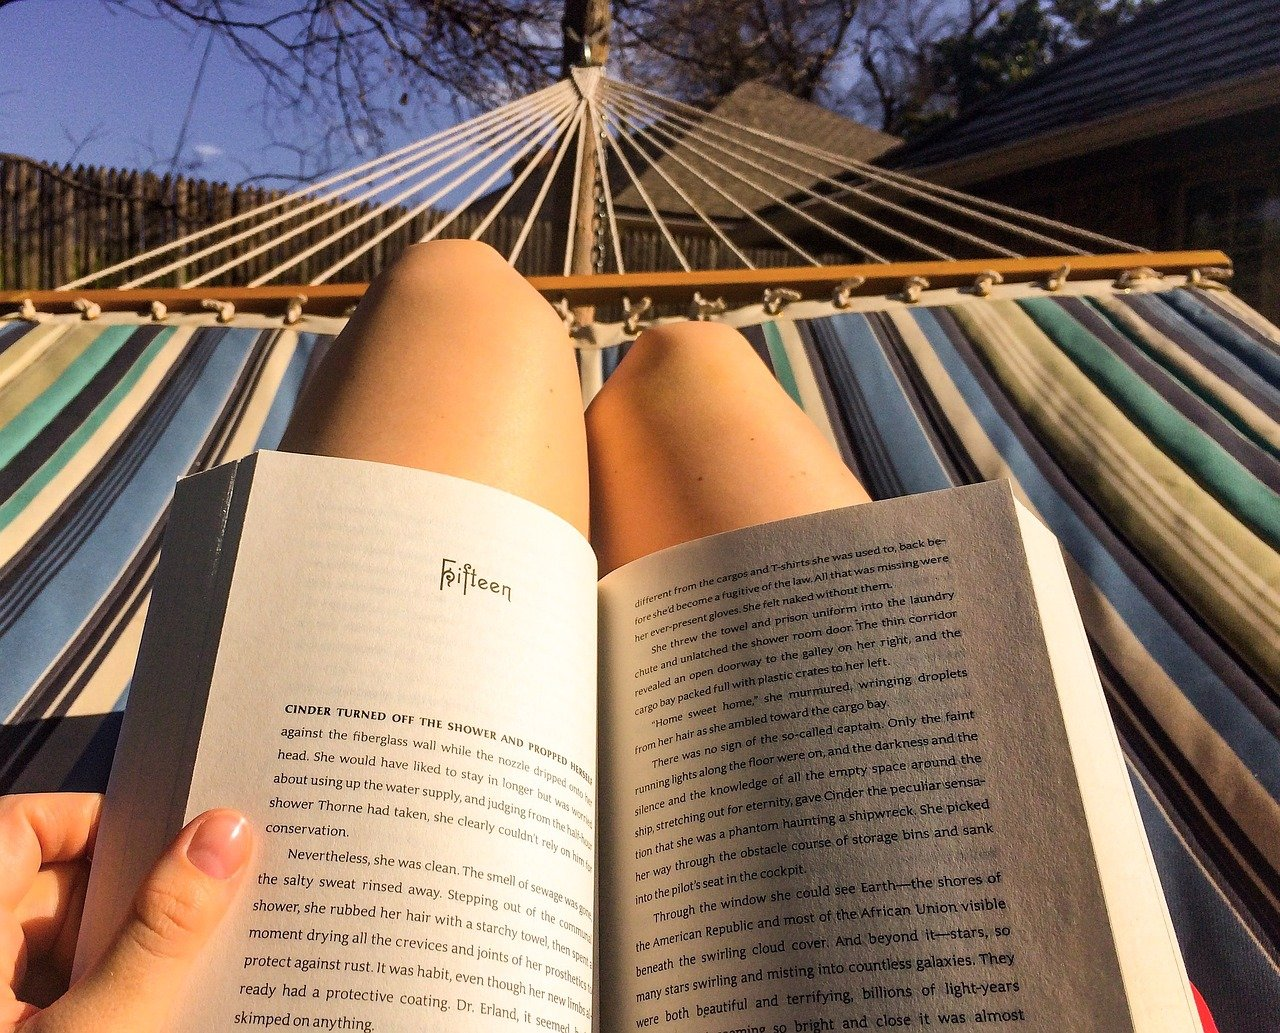 reading, hammock, relax